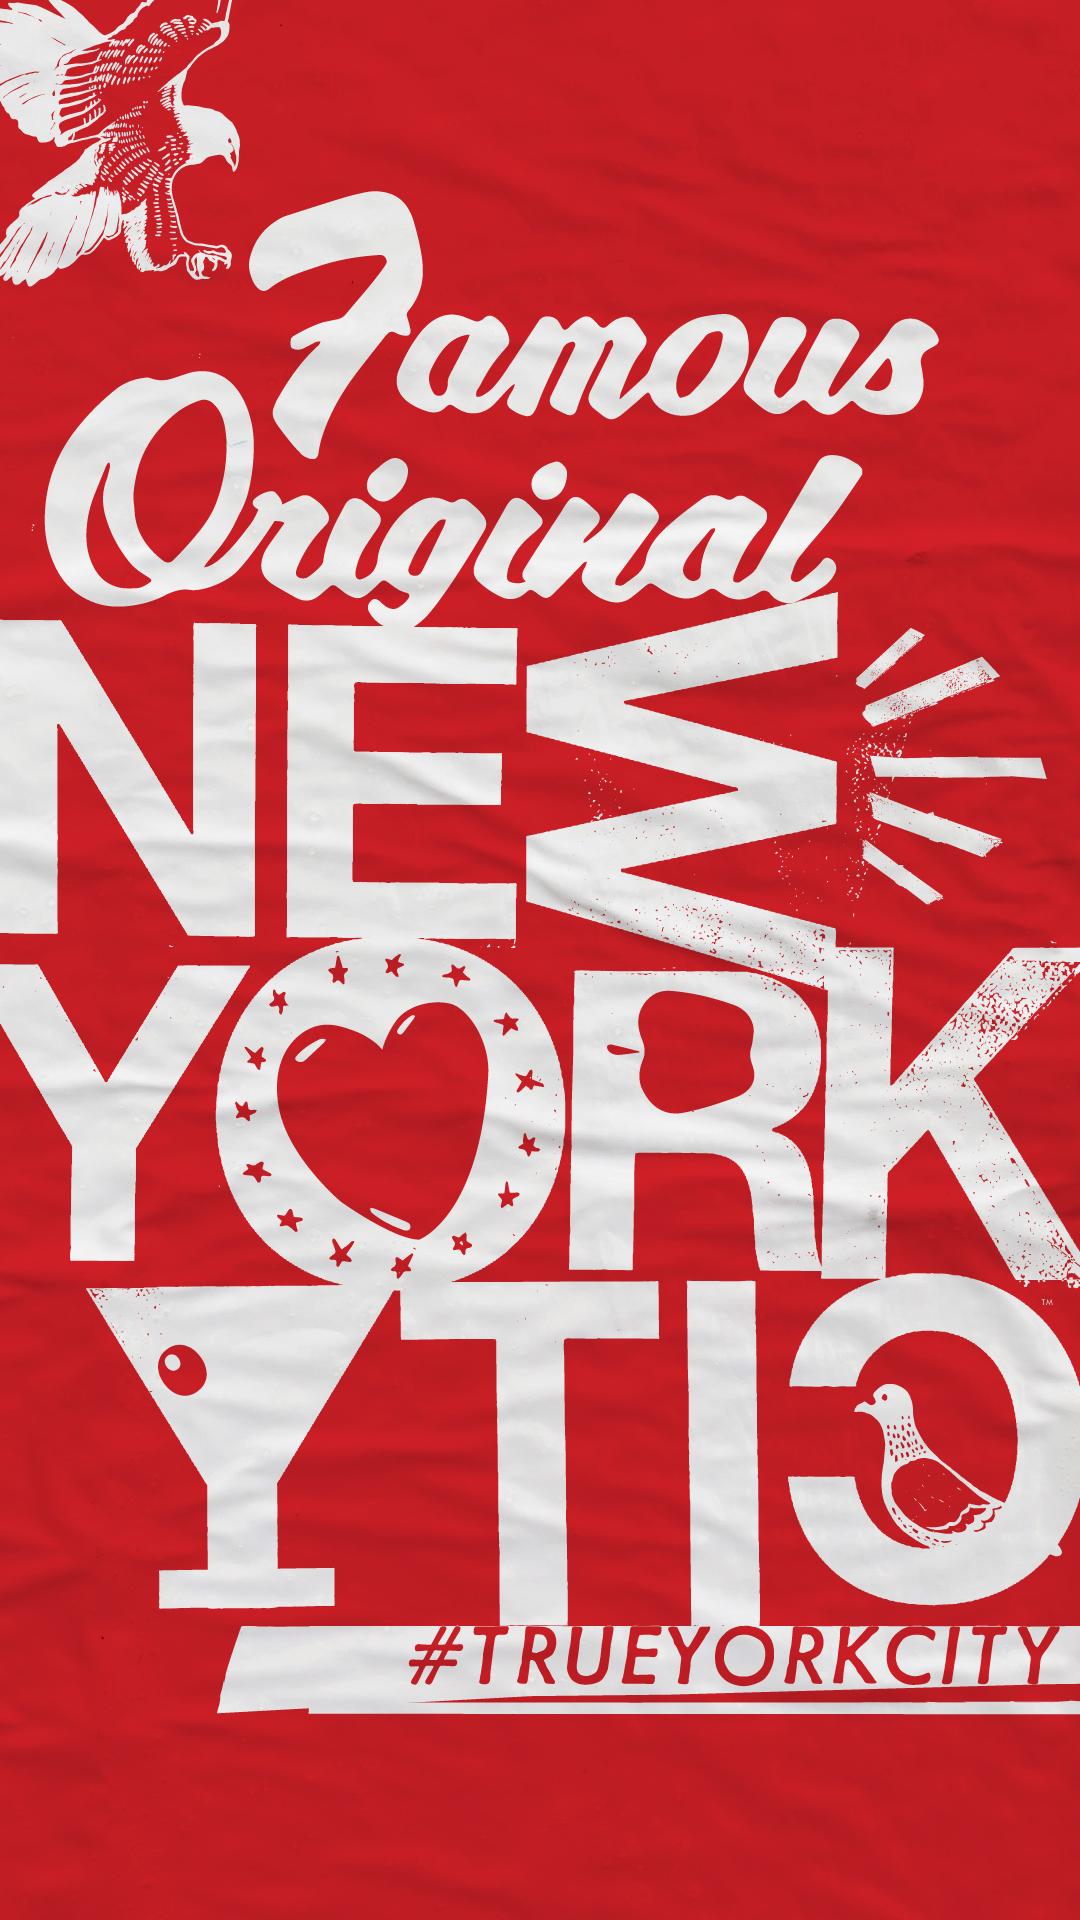 NYC -NYCGO_TourismCampaign_Link_NYC.jpg